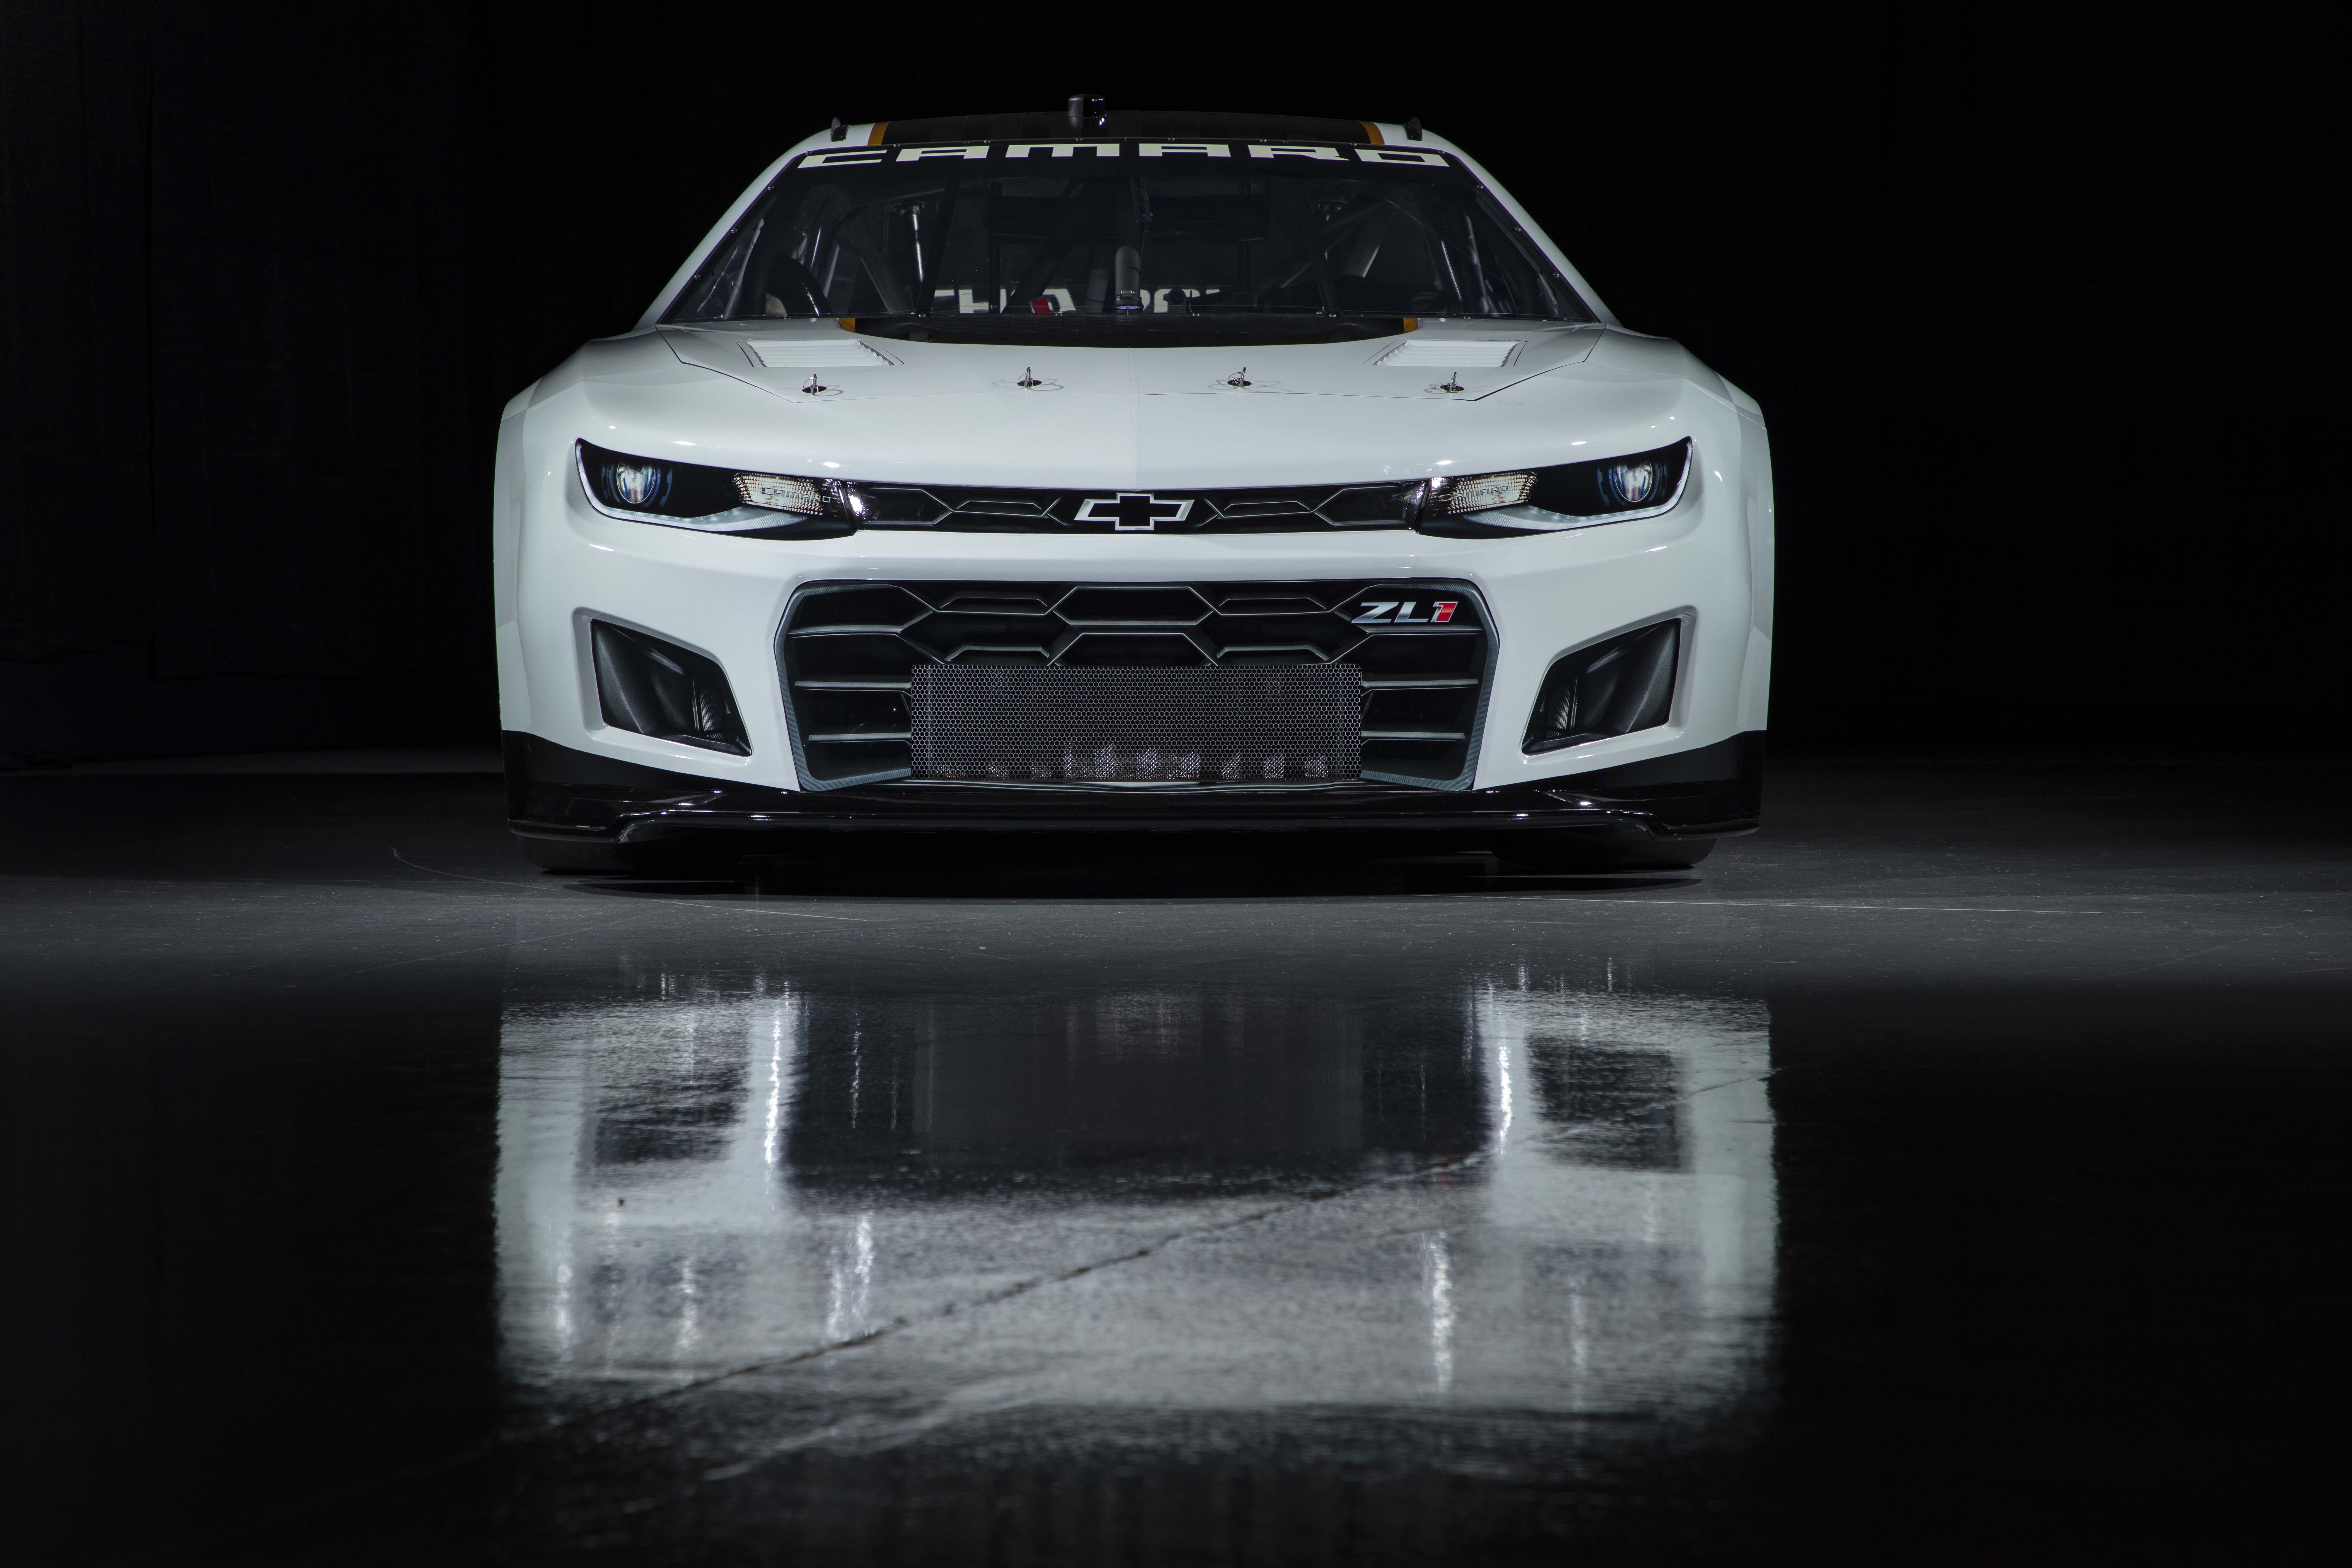 Chevrolet Camaro - 2022 Next Gen Car - Front Photo